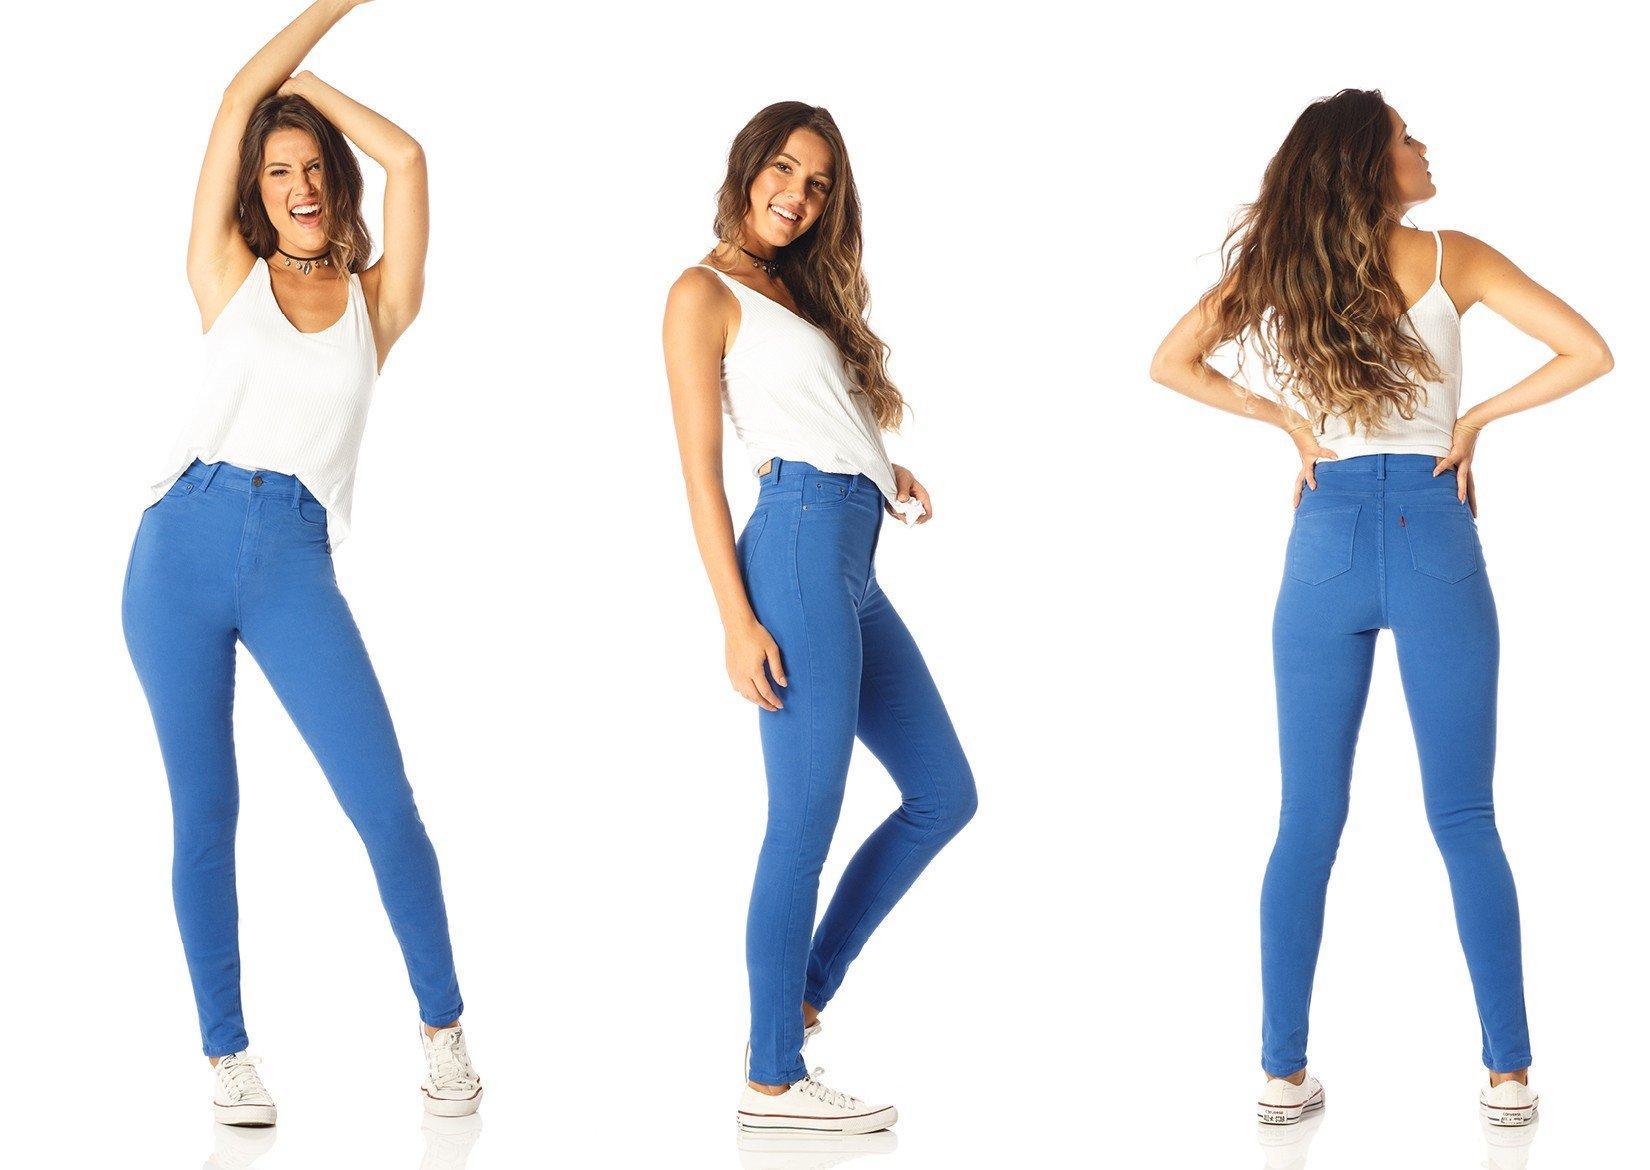 calca skinny hot pants dz2528 anil descricao denim zero